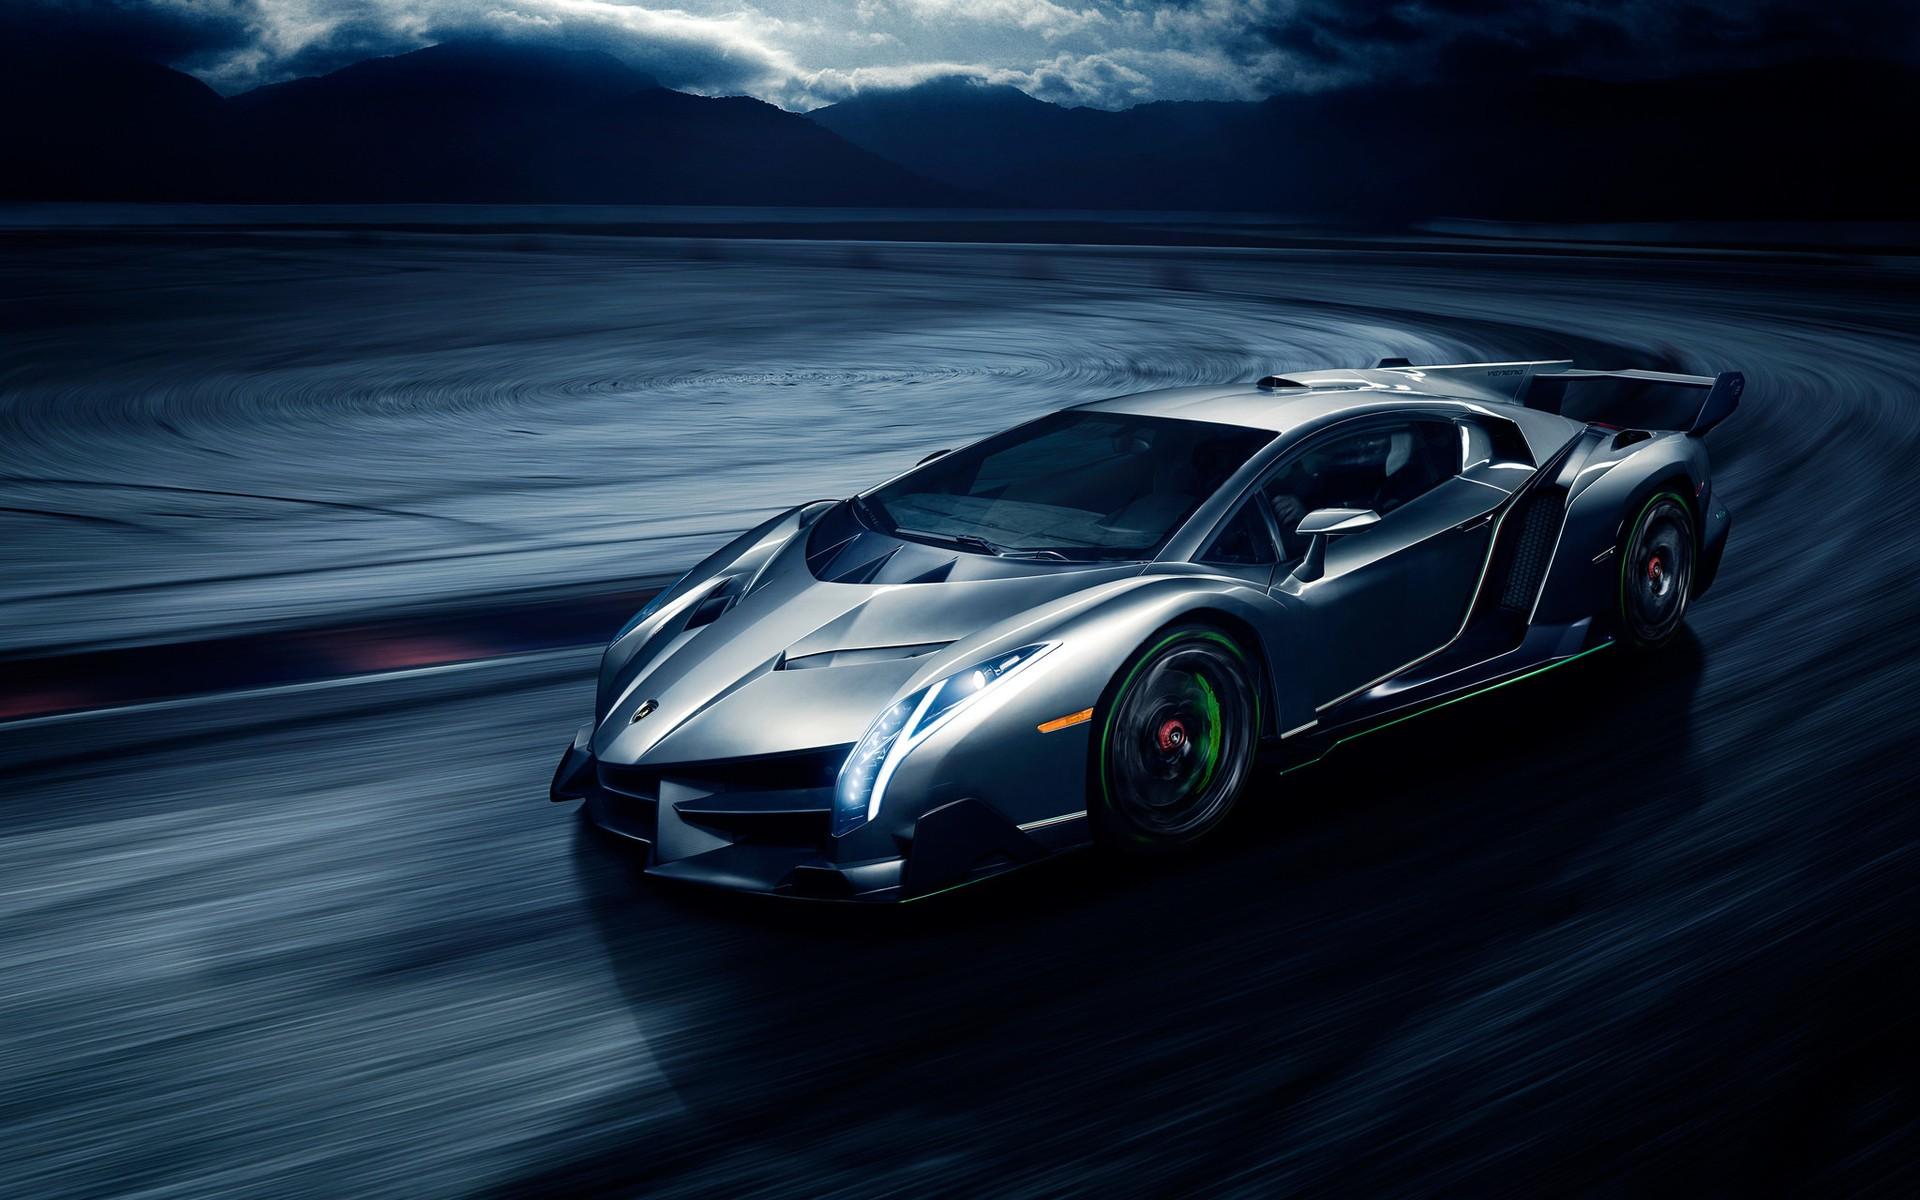 wallpaper : super car, sports car, lamborghini veneno, performance